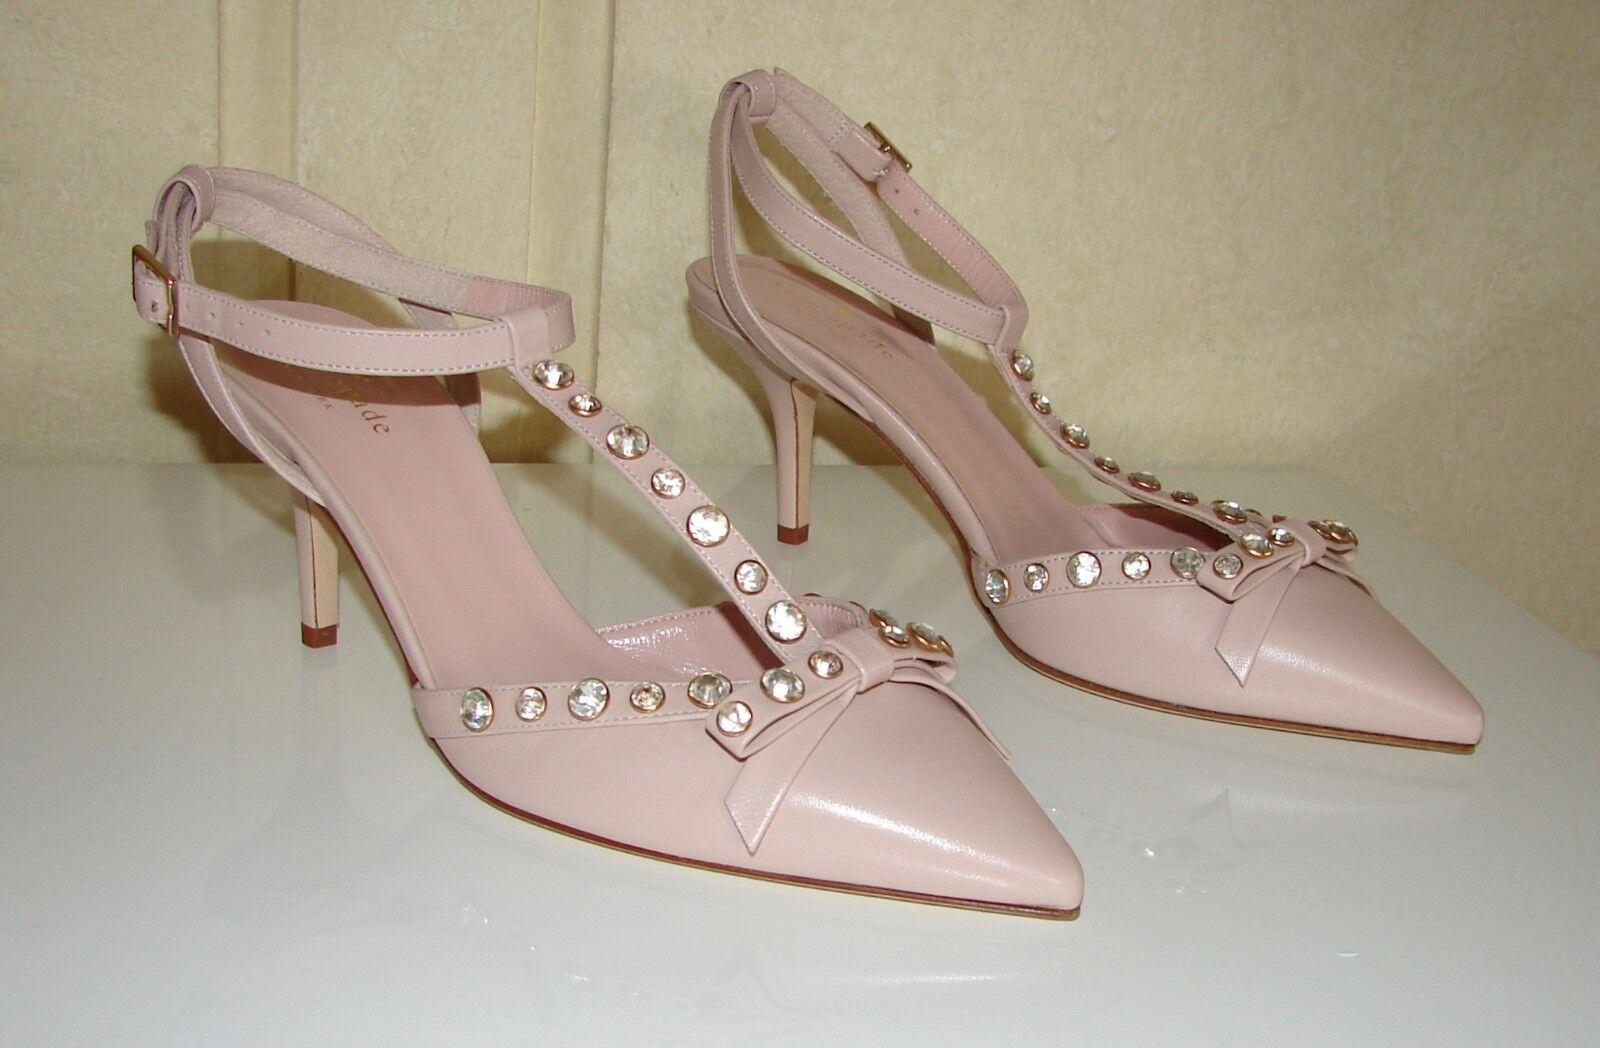 NIB Kate Spade sz 8.5 Julianna petal Rosa nappa leather rhinestone bow schuhe